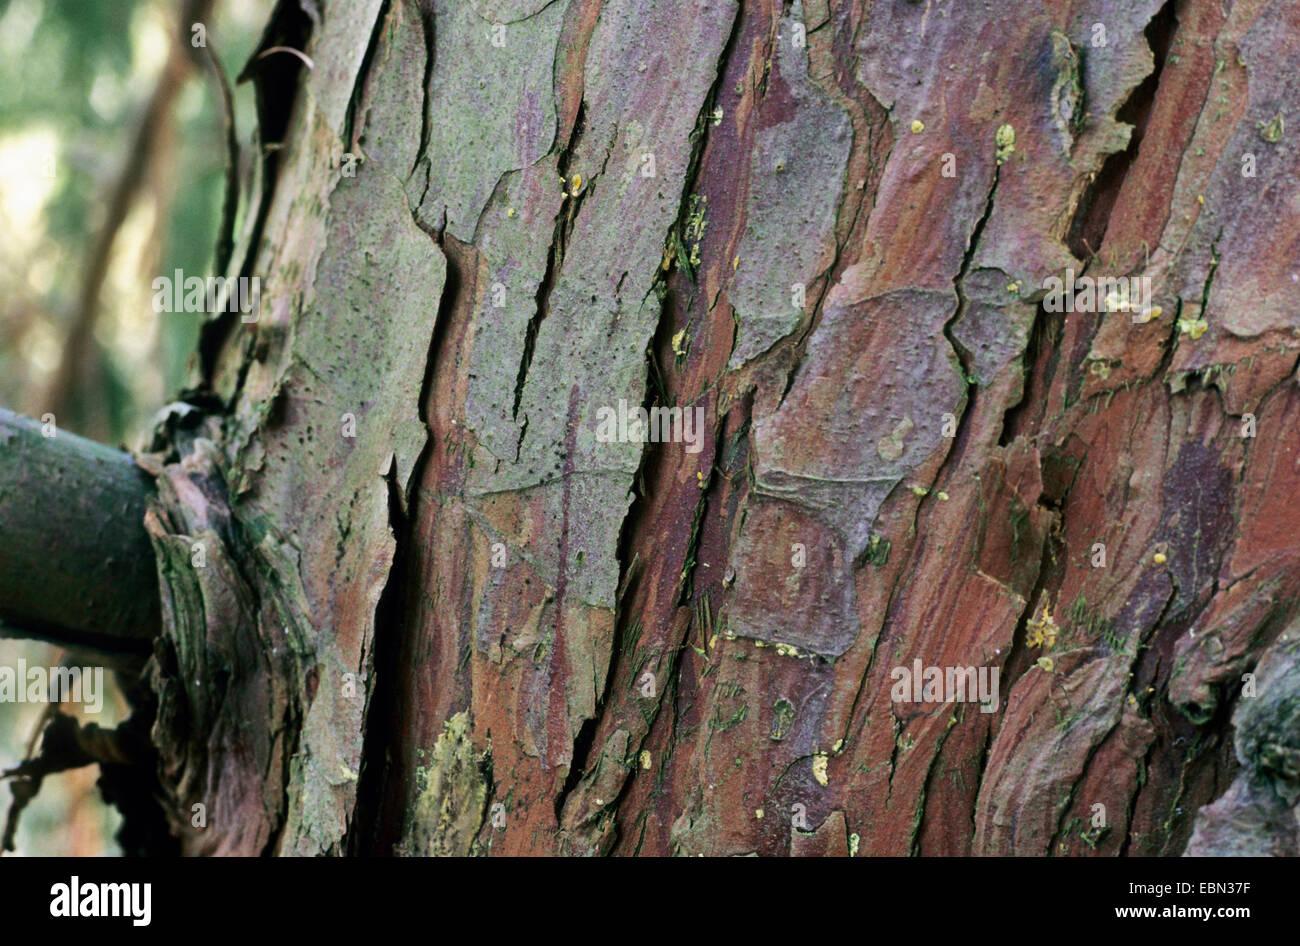 Weeping Yellow-cedar (Cupressus nootkatensis 'Pendula', Cupressus nootkatensis Pendula, Chamaecyparis nootkatensis - Stock Image